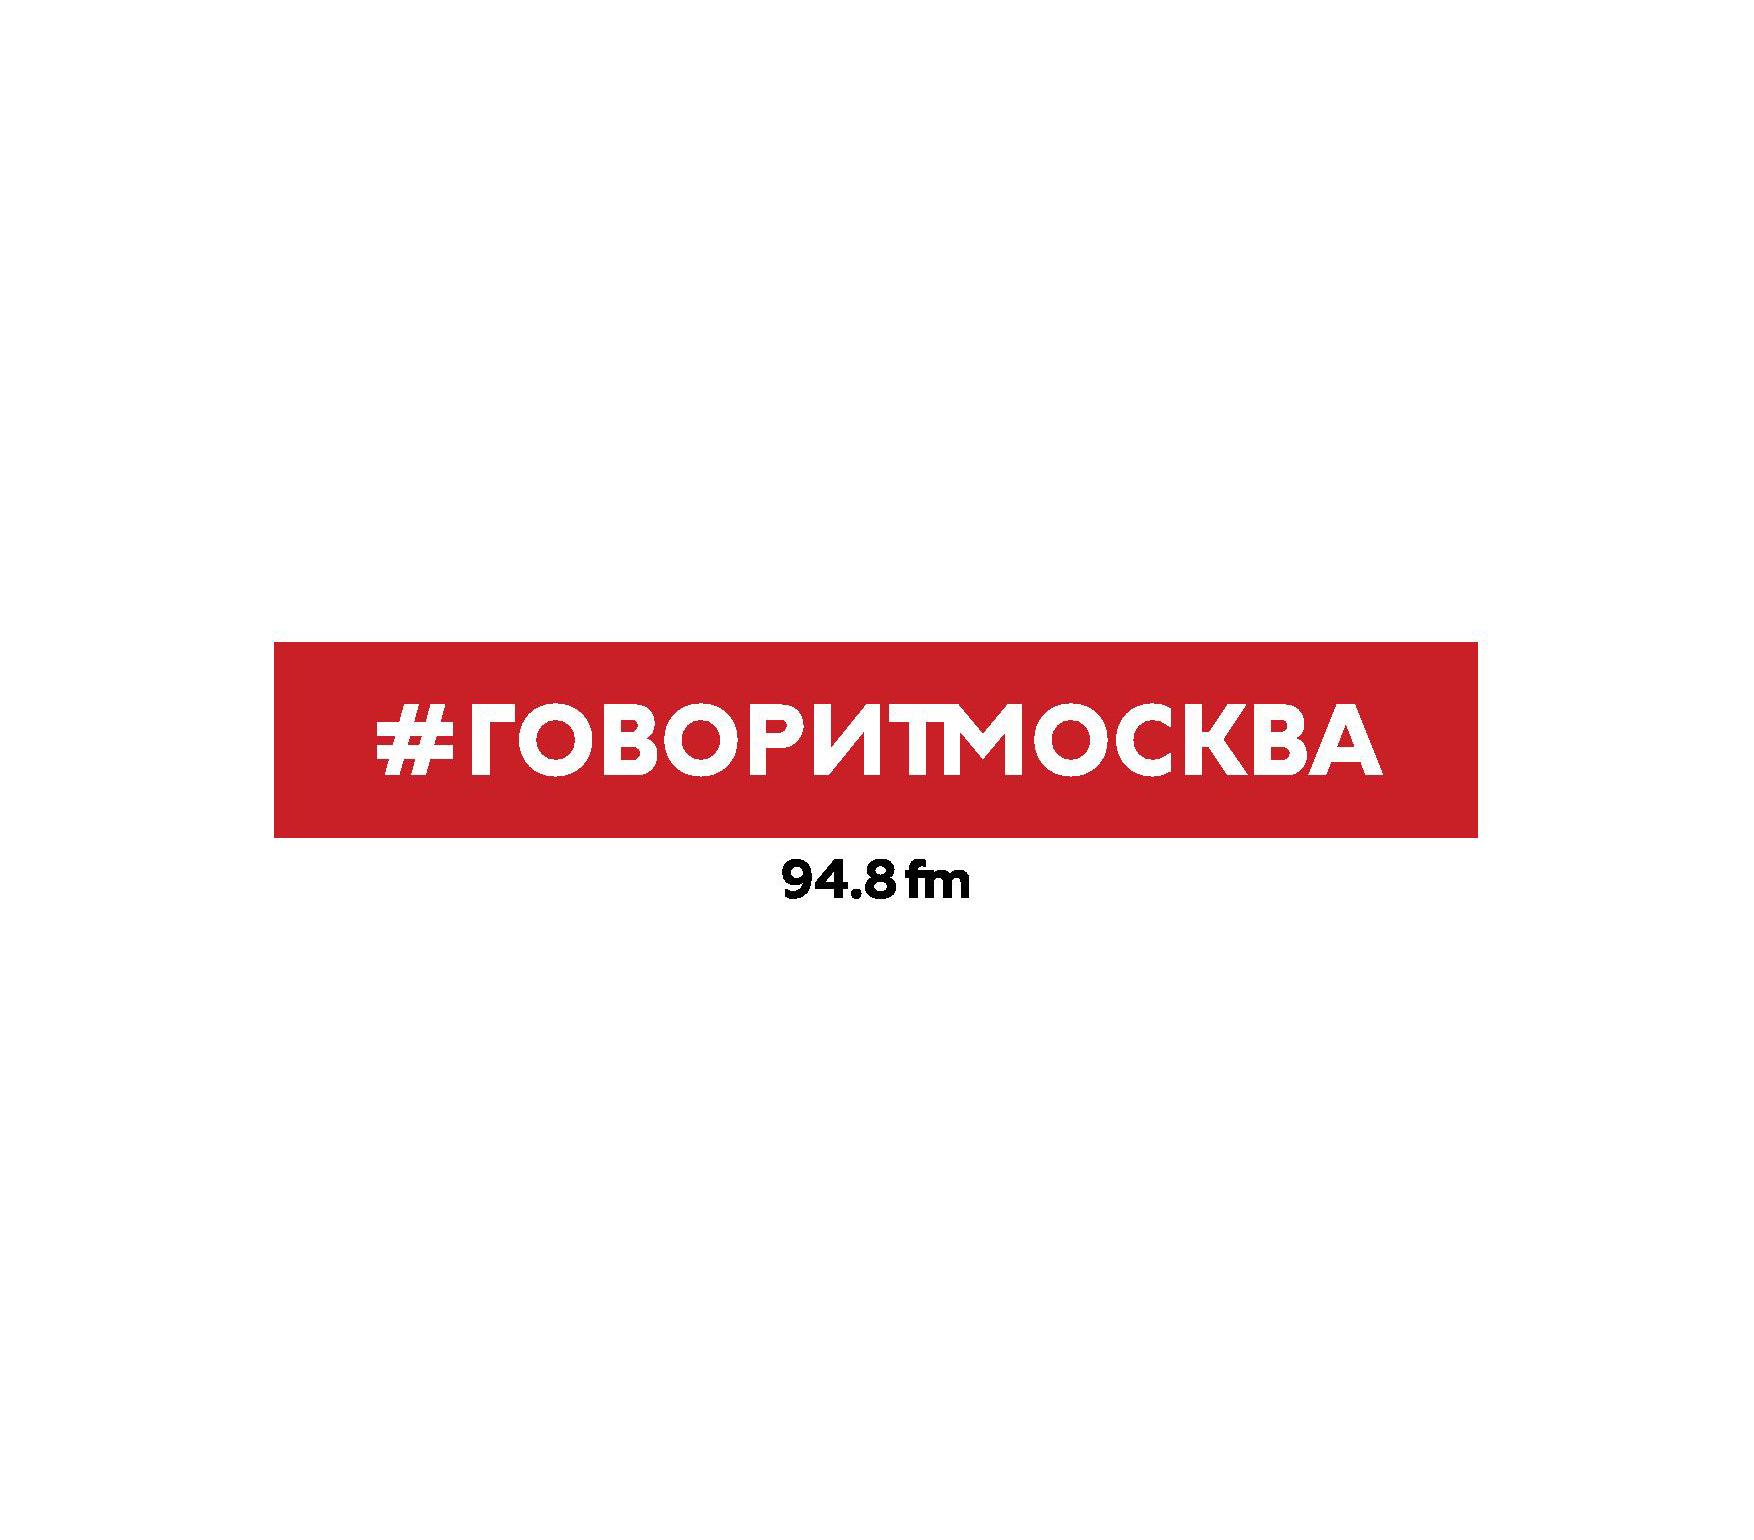 Макс Челноков 8 мая. Константин Хабенский макс челноков 4 мая валерий меладзе